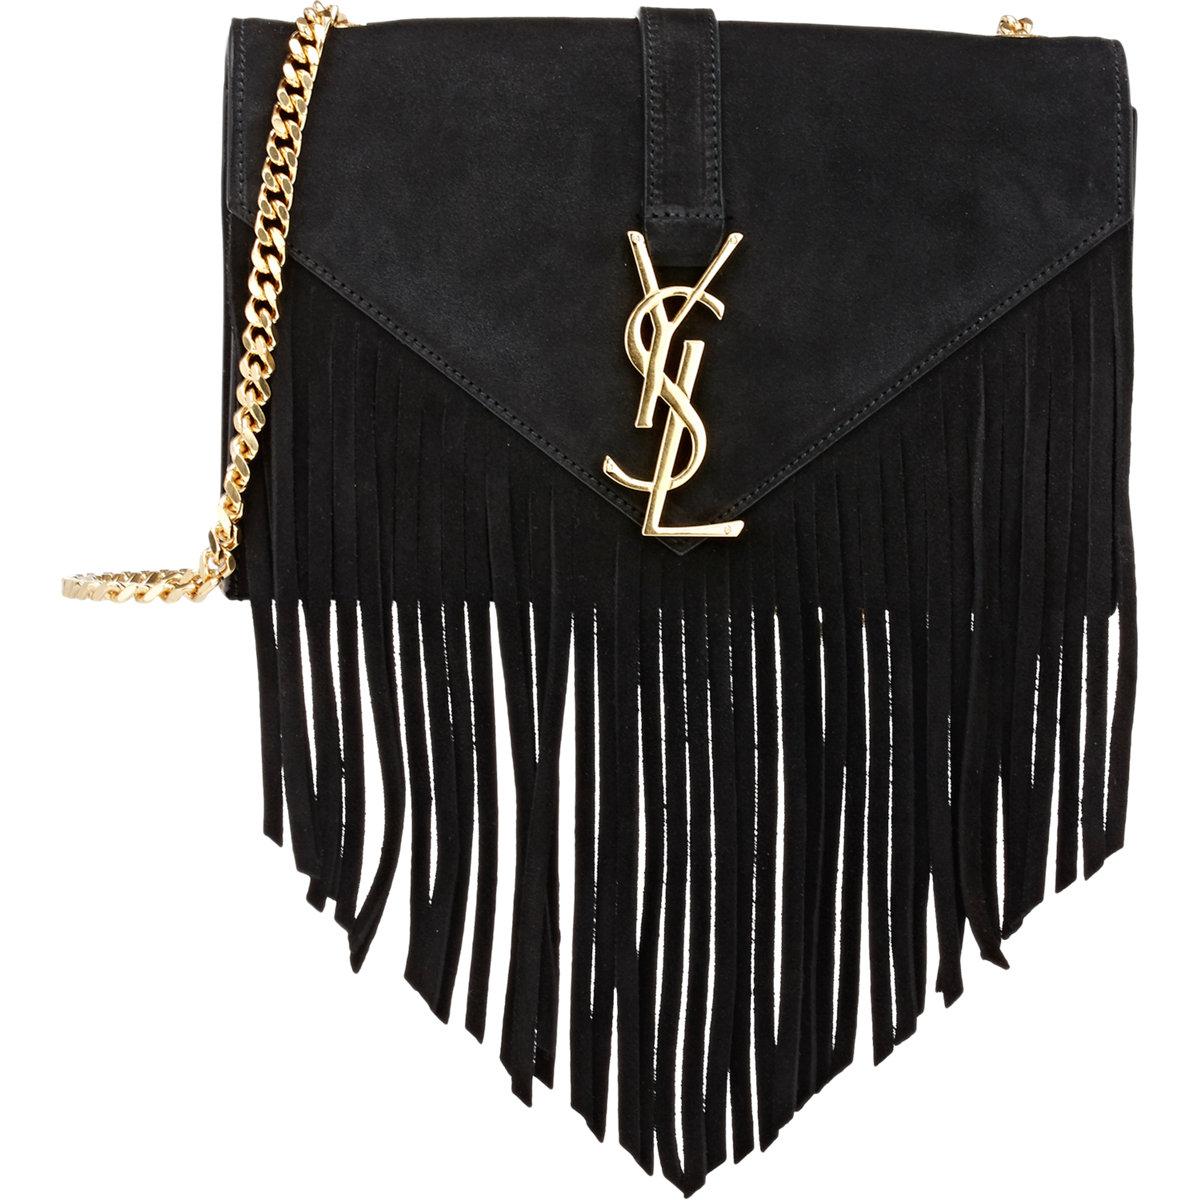 7b60163948c6 Saint laurent Women  39 s Fringed Monogram Shoulder Bag in Black (BLACK